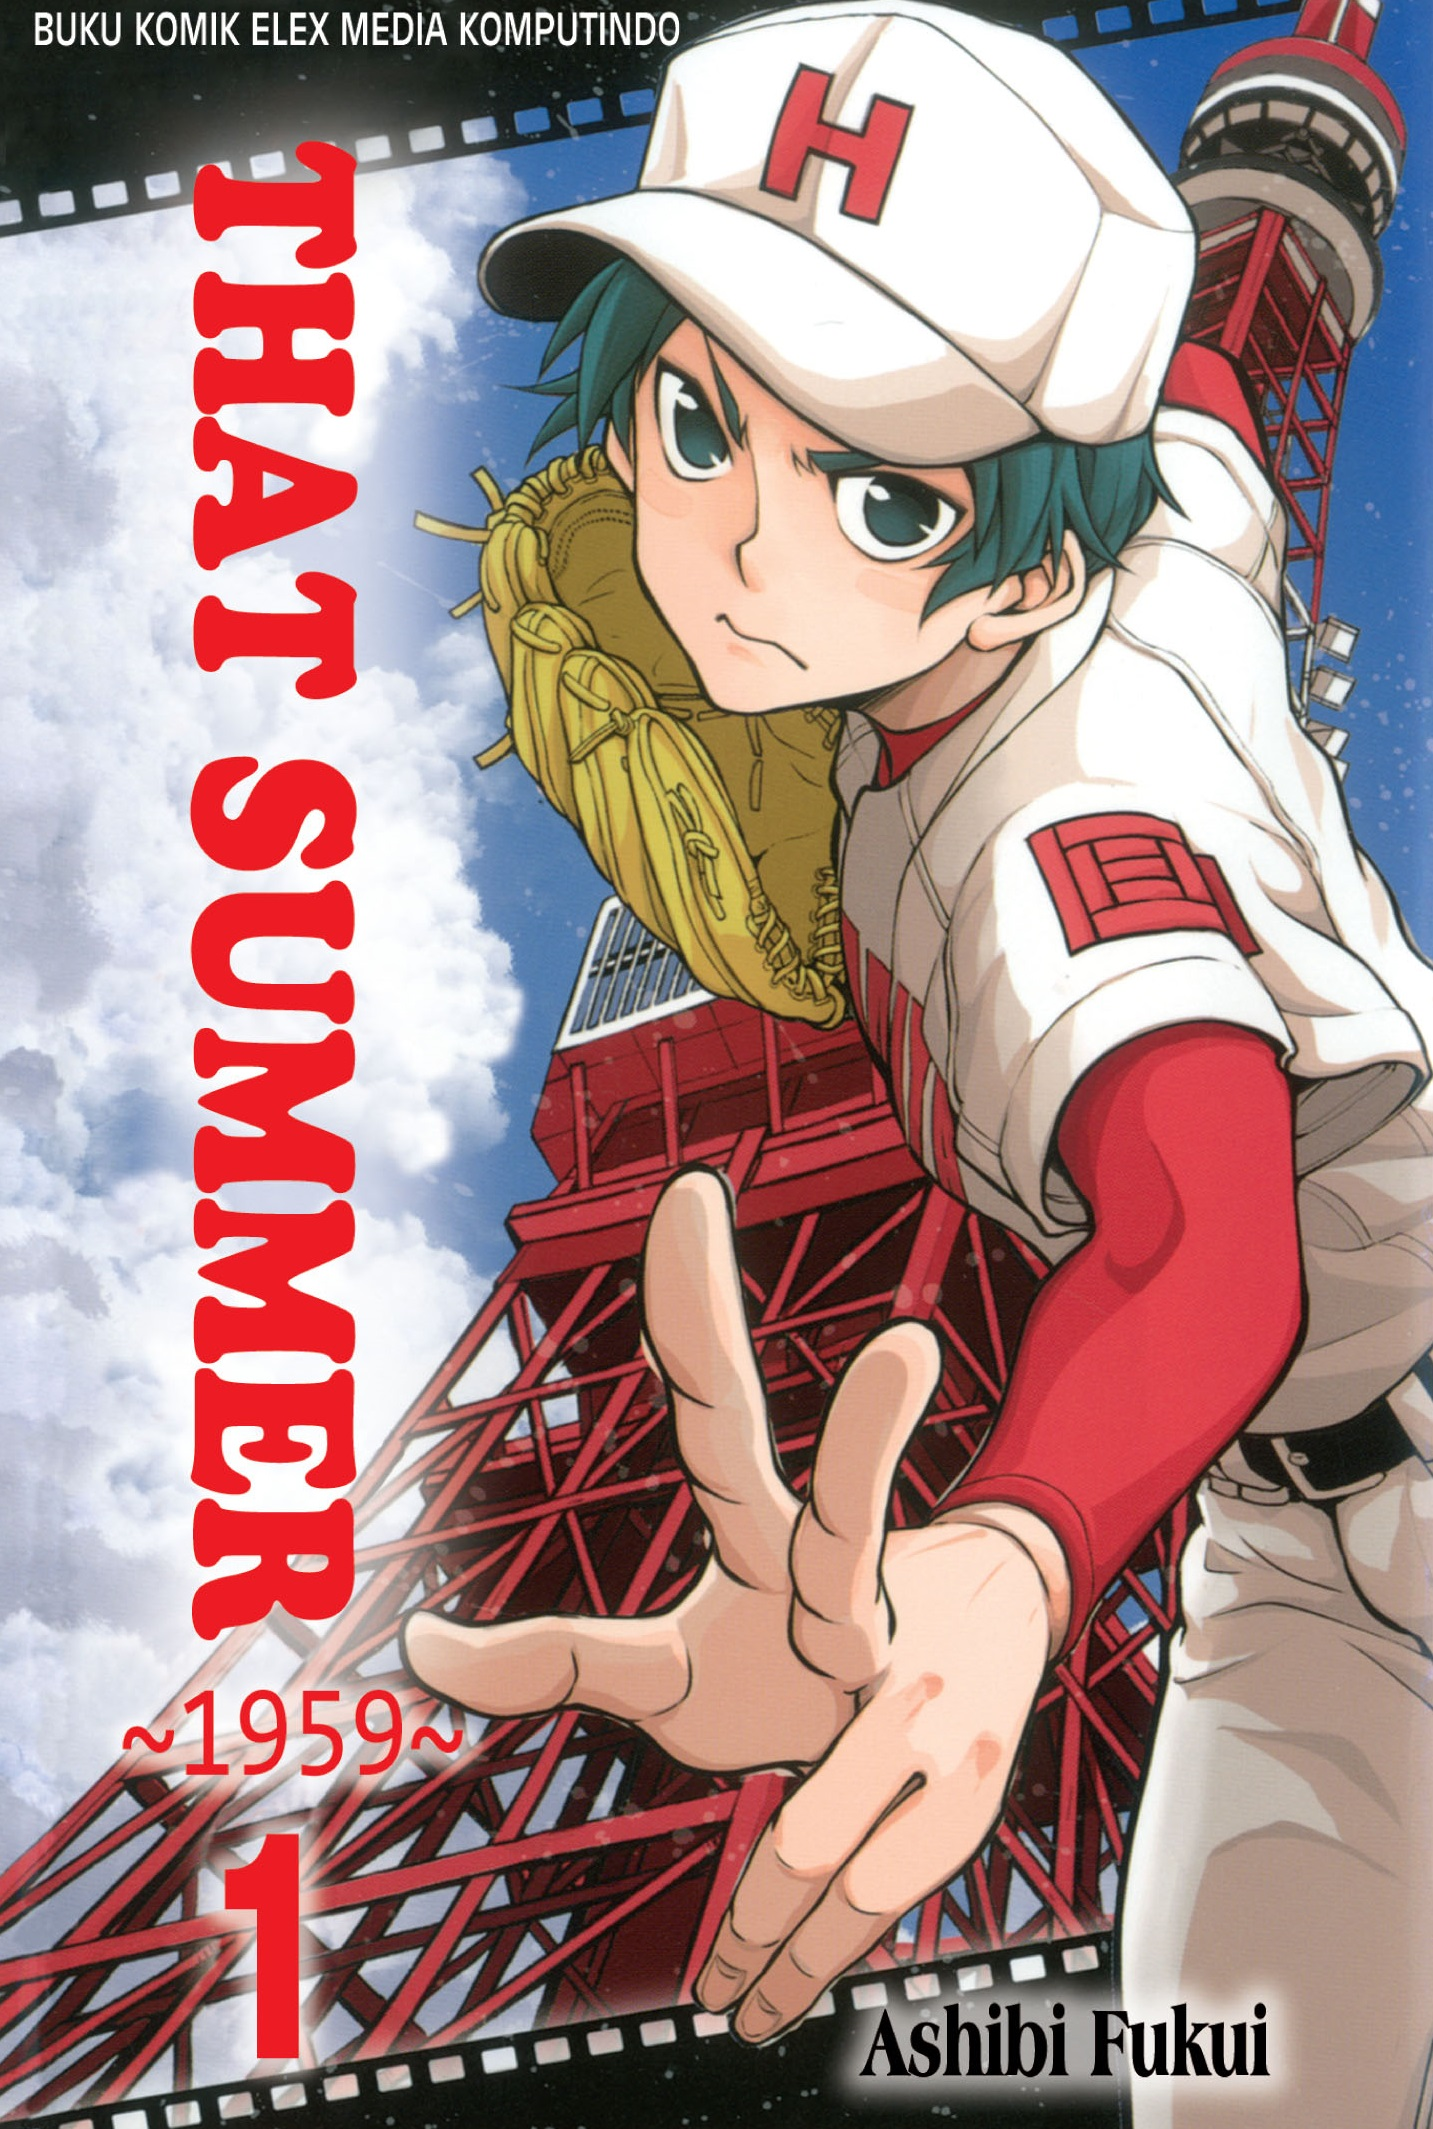 That Summer 1959 Volume 1 Ashibi Fukui